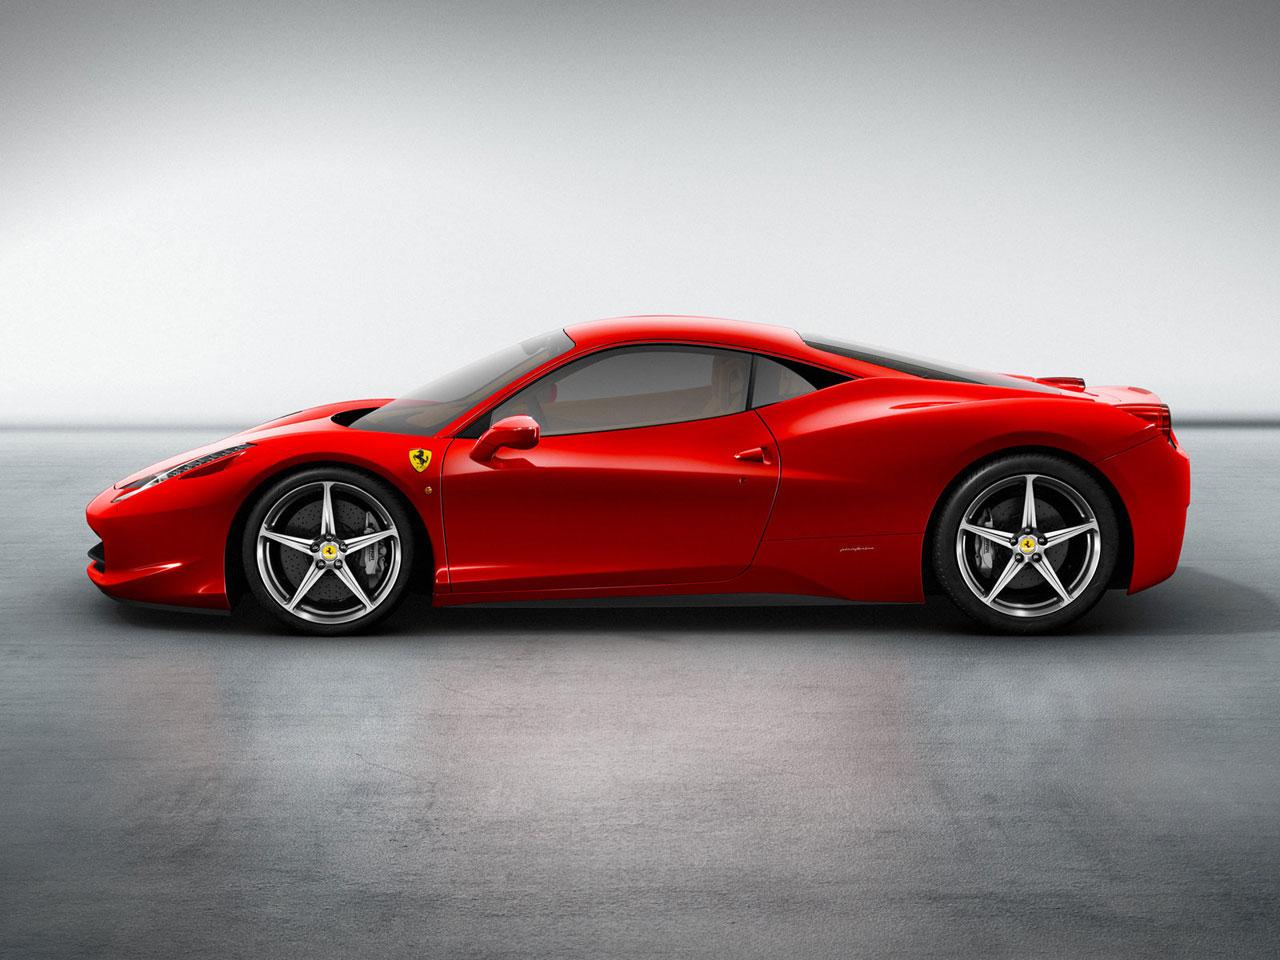 ferrari 458 italia car body design. Black Bedroom Furniture Sets. Home Design Ideas